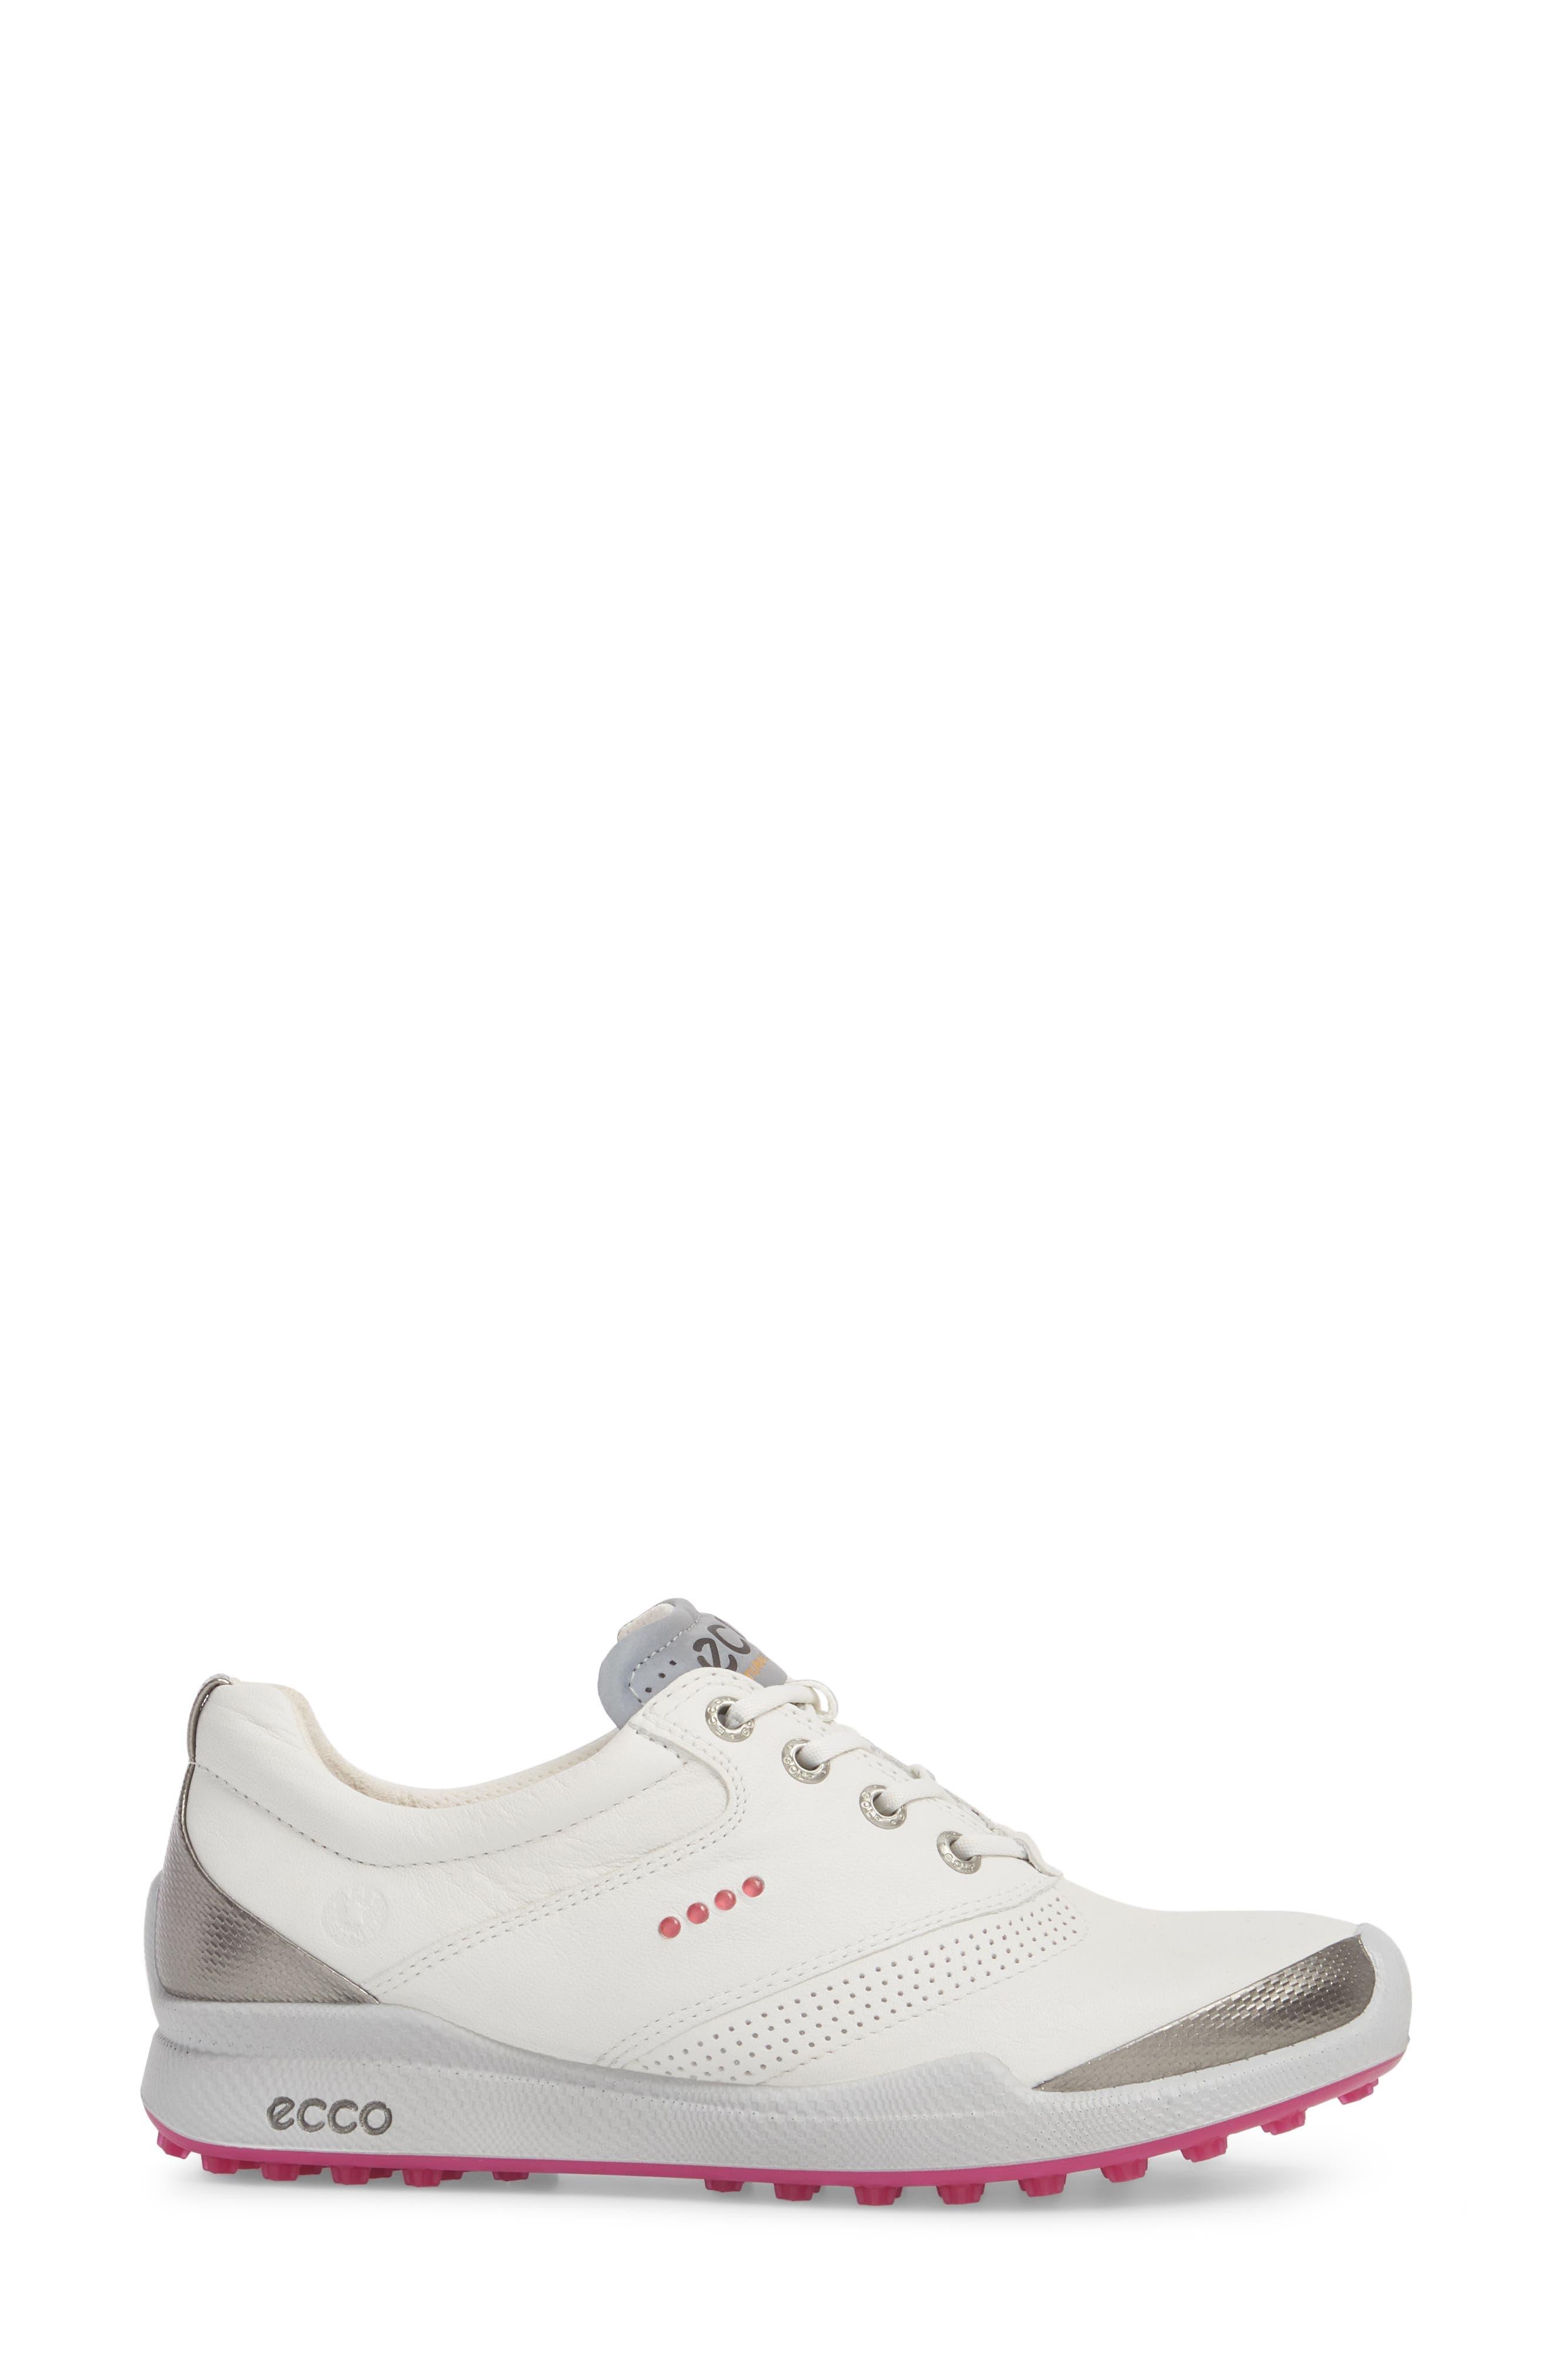 Biom Hybrid Golf Shoe,                             Alternate thumbnail 5, color,